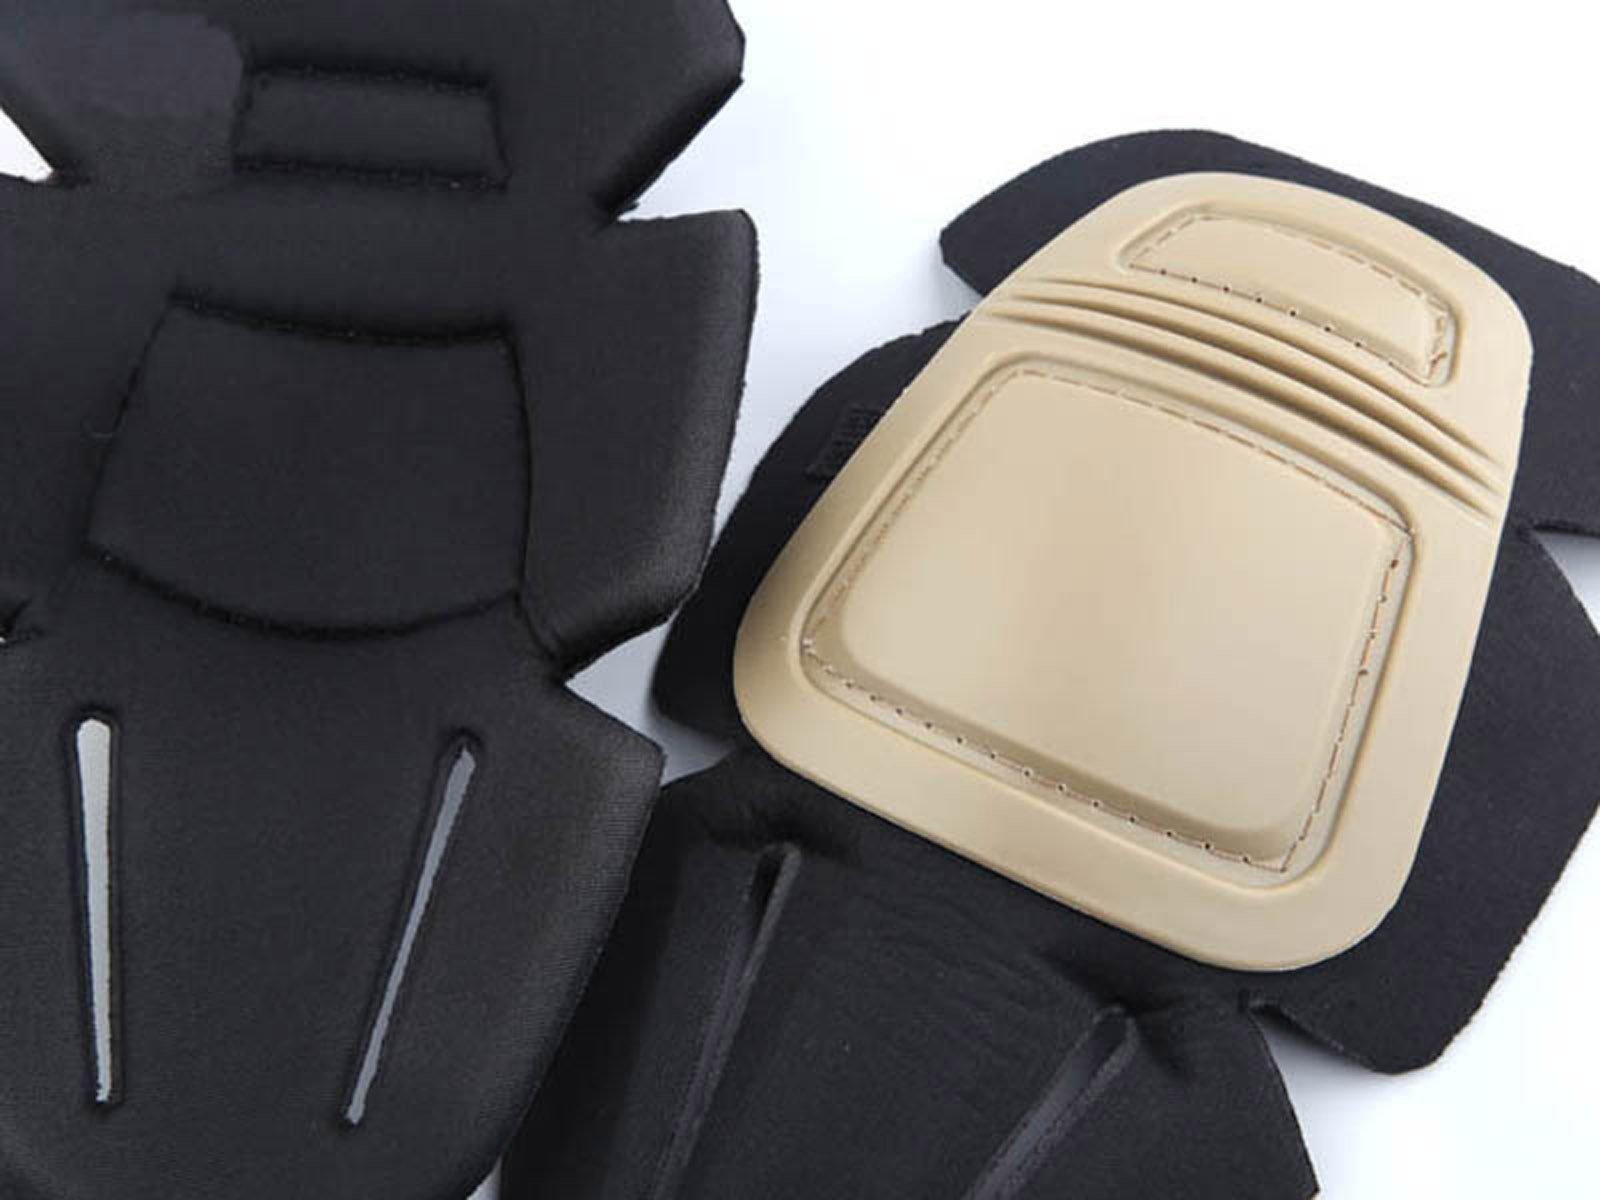 Men Army Military Equipment Airsoft Paintball Tactical Clothes Combat Gen 3 BDU Uniform Shirt Pants Knee Pad Multicam (S) by Uniform